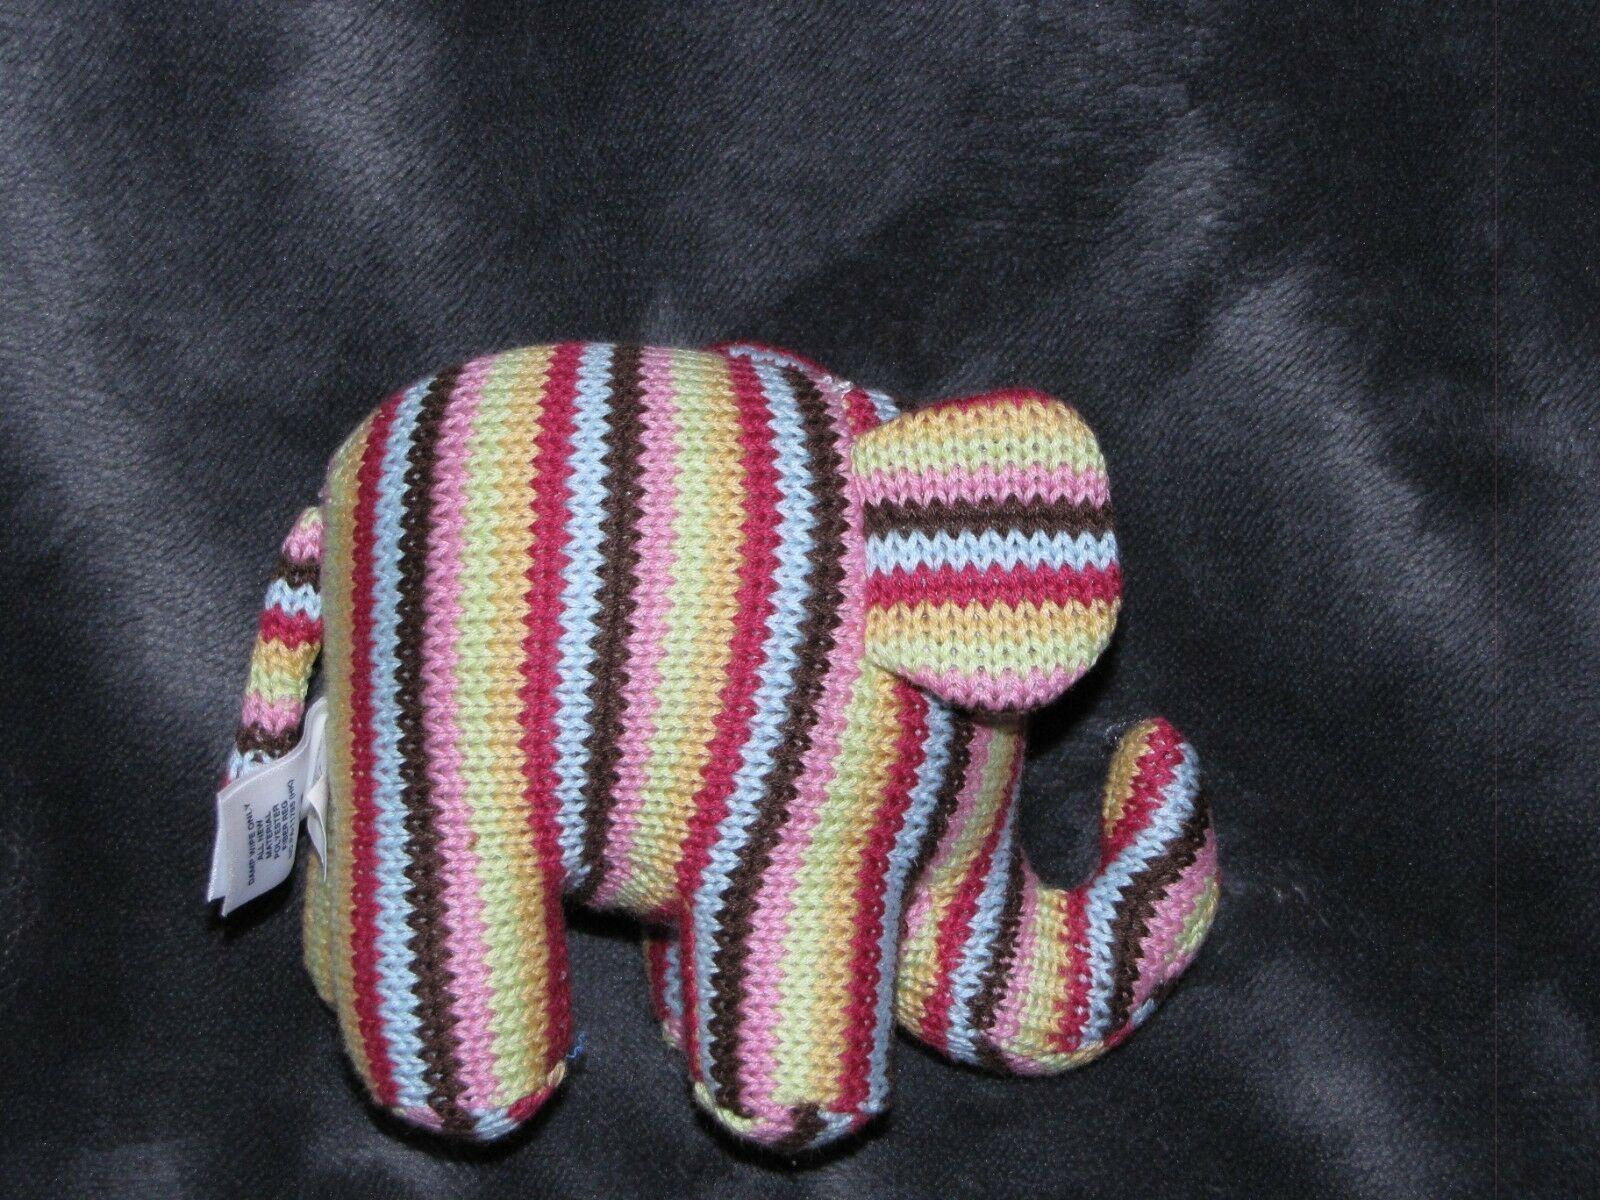 25 Easy Elephant Crochet Patterns that Make Great Gift ideas! | 1200x1600